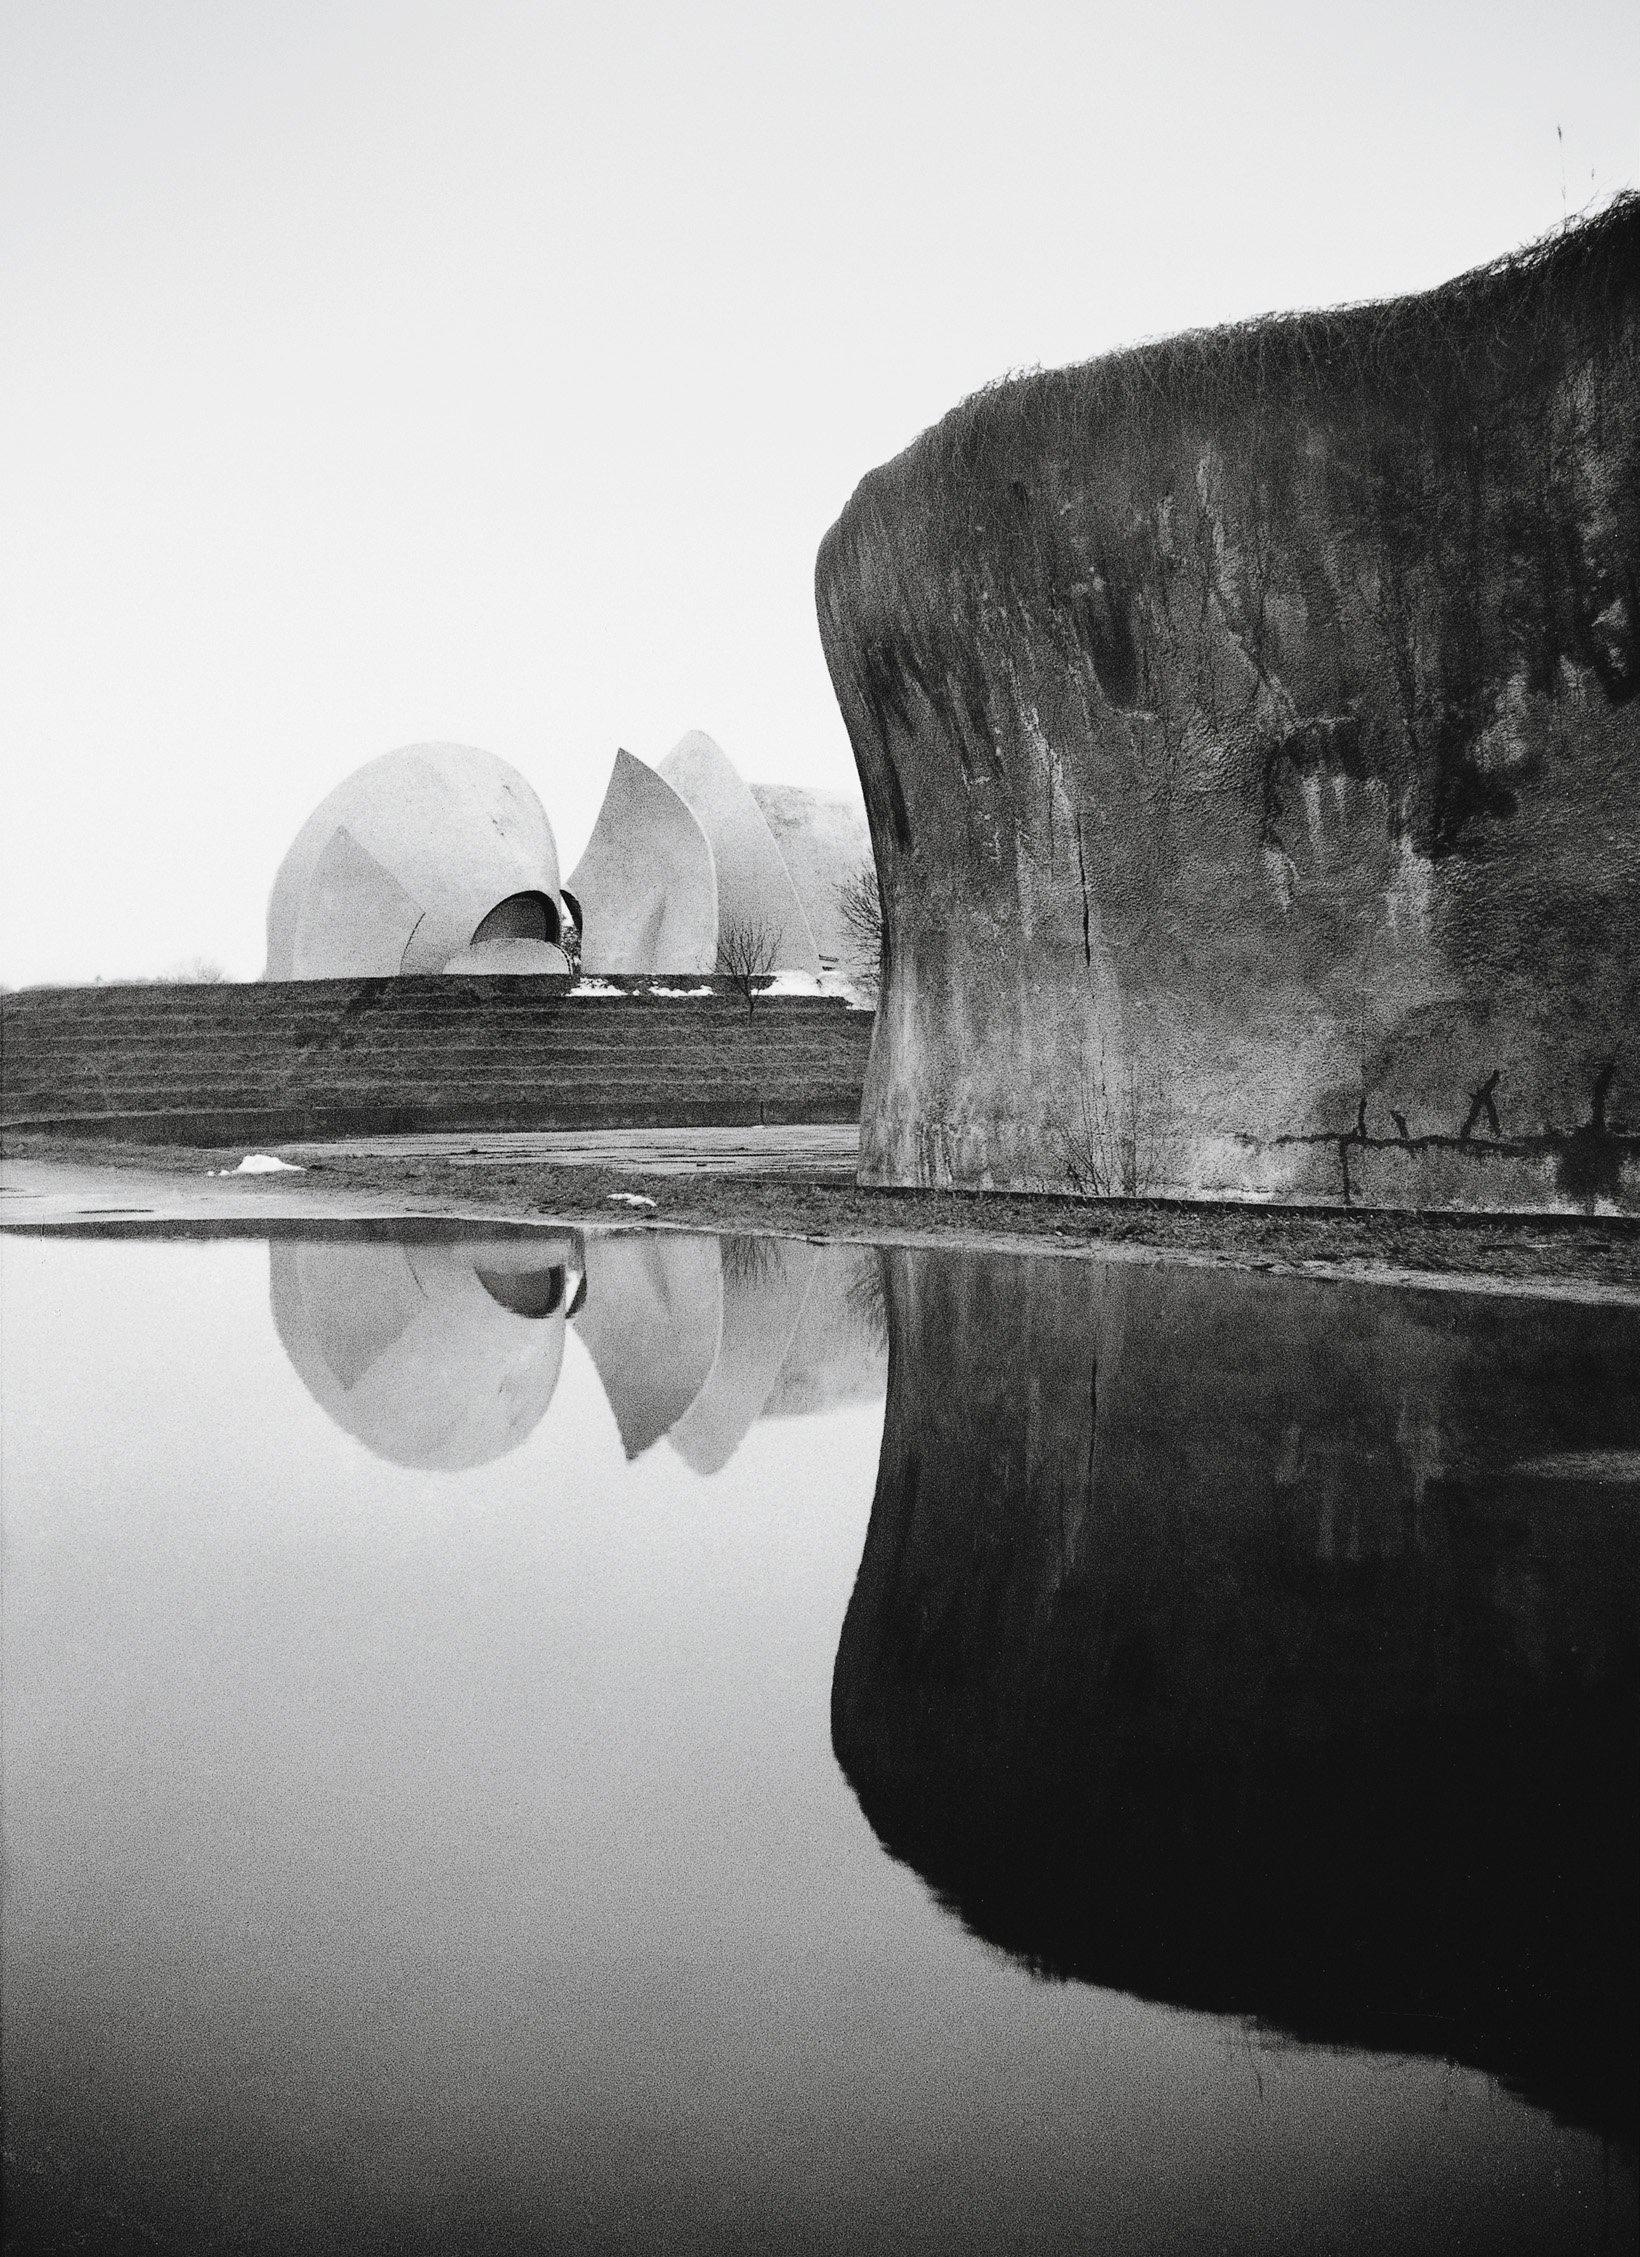 Cosmic Communist Constructions Photographed (CCCP) by Frédéric Chaubin's